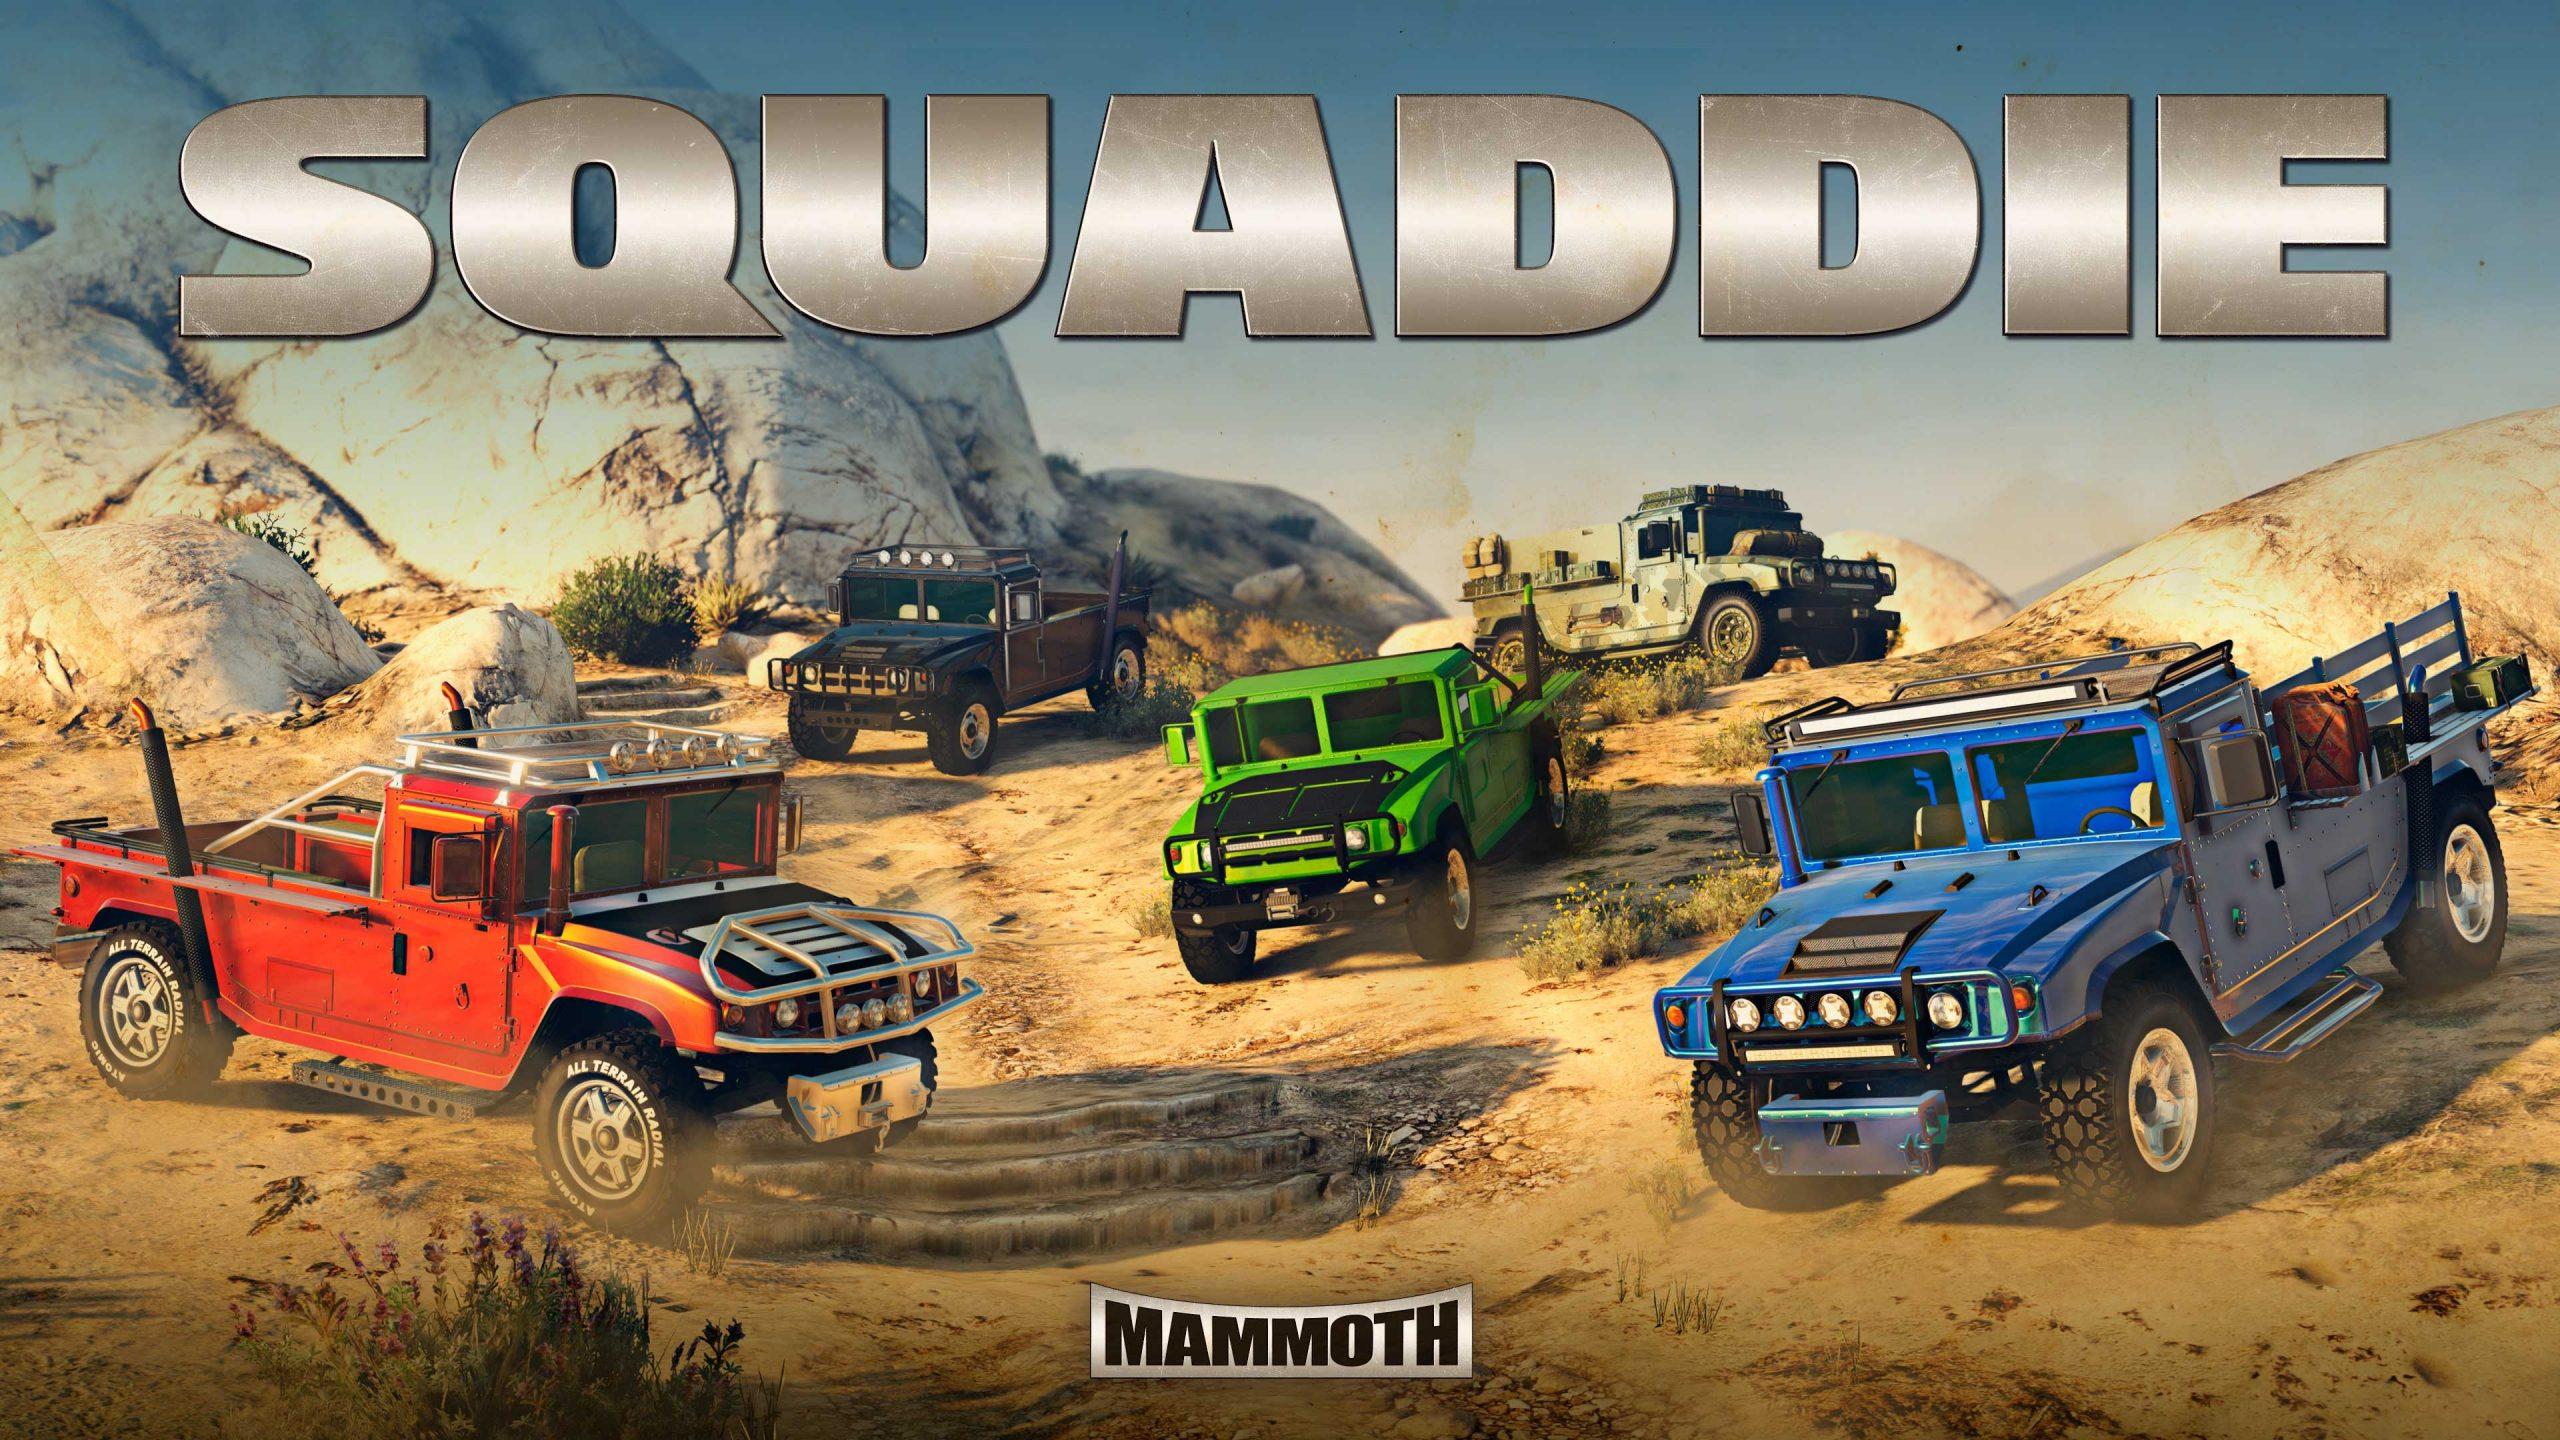 Mammoth Squaddie